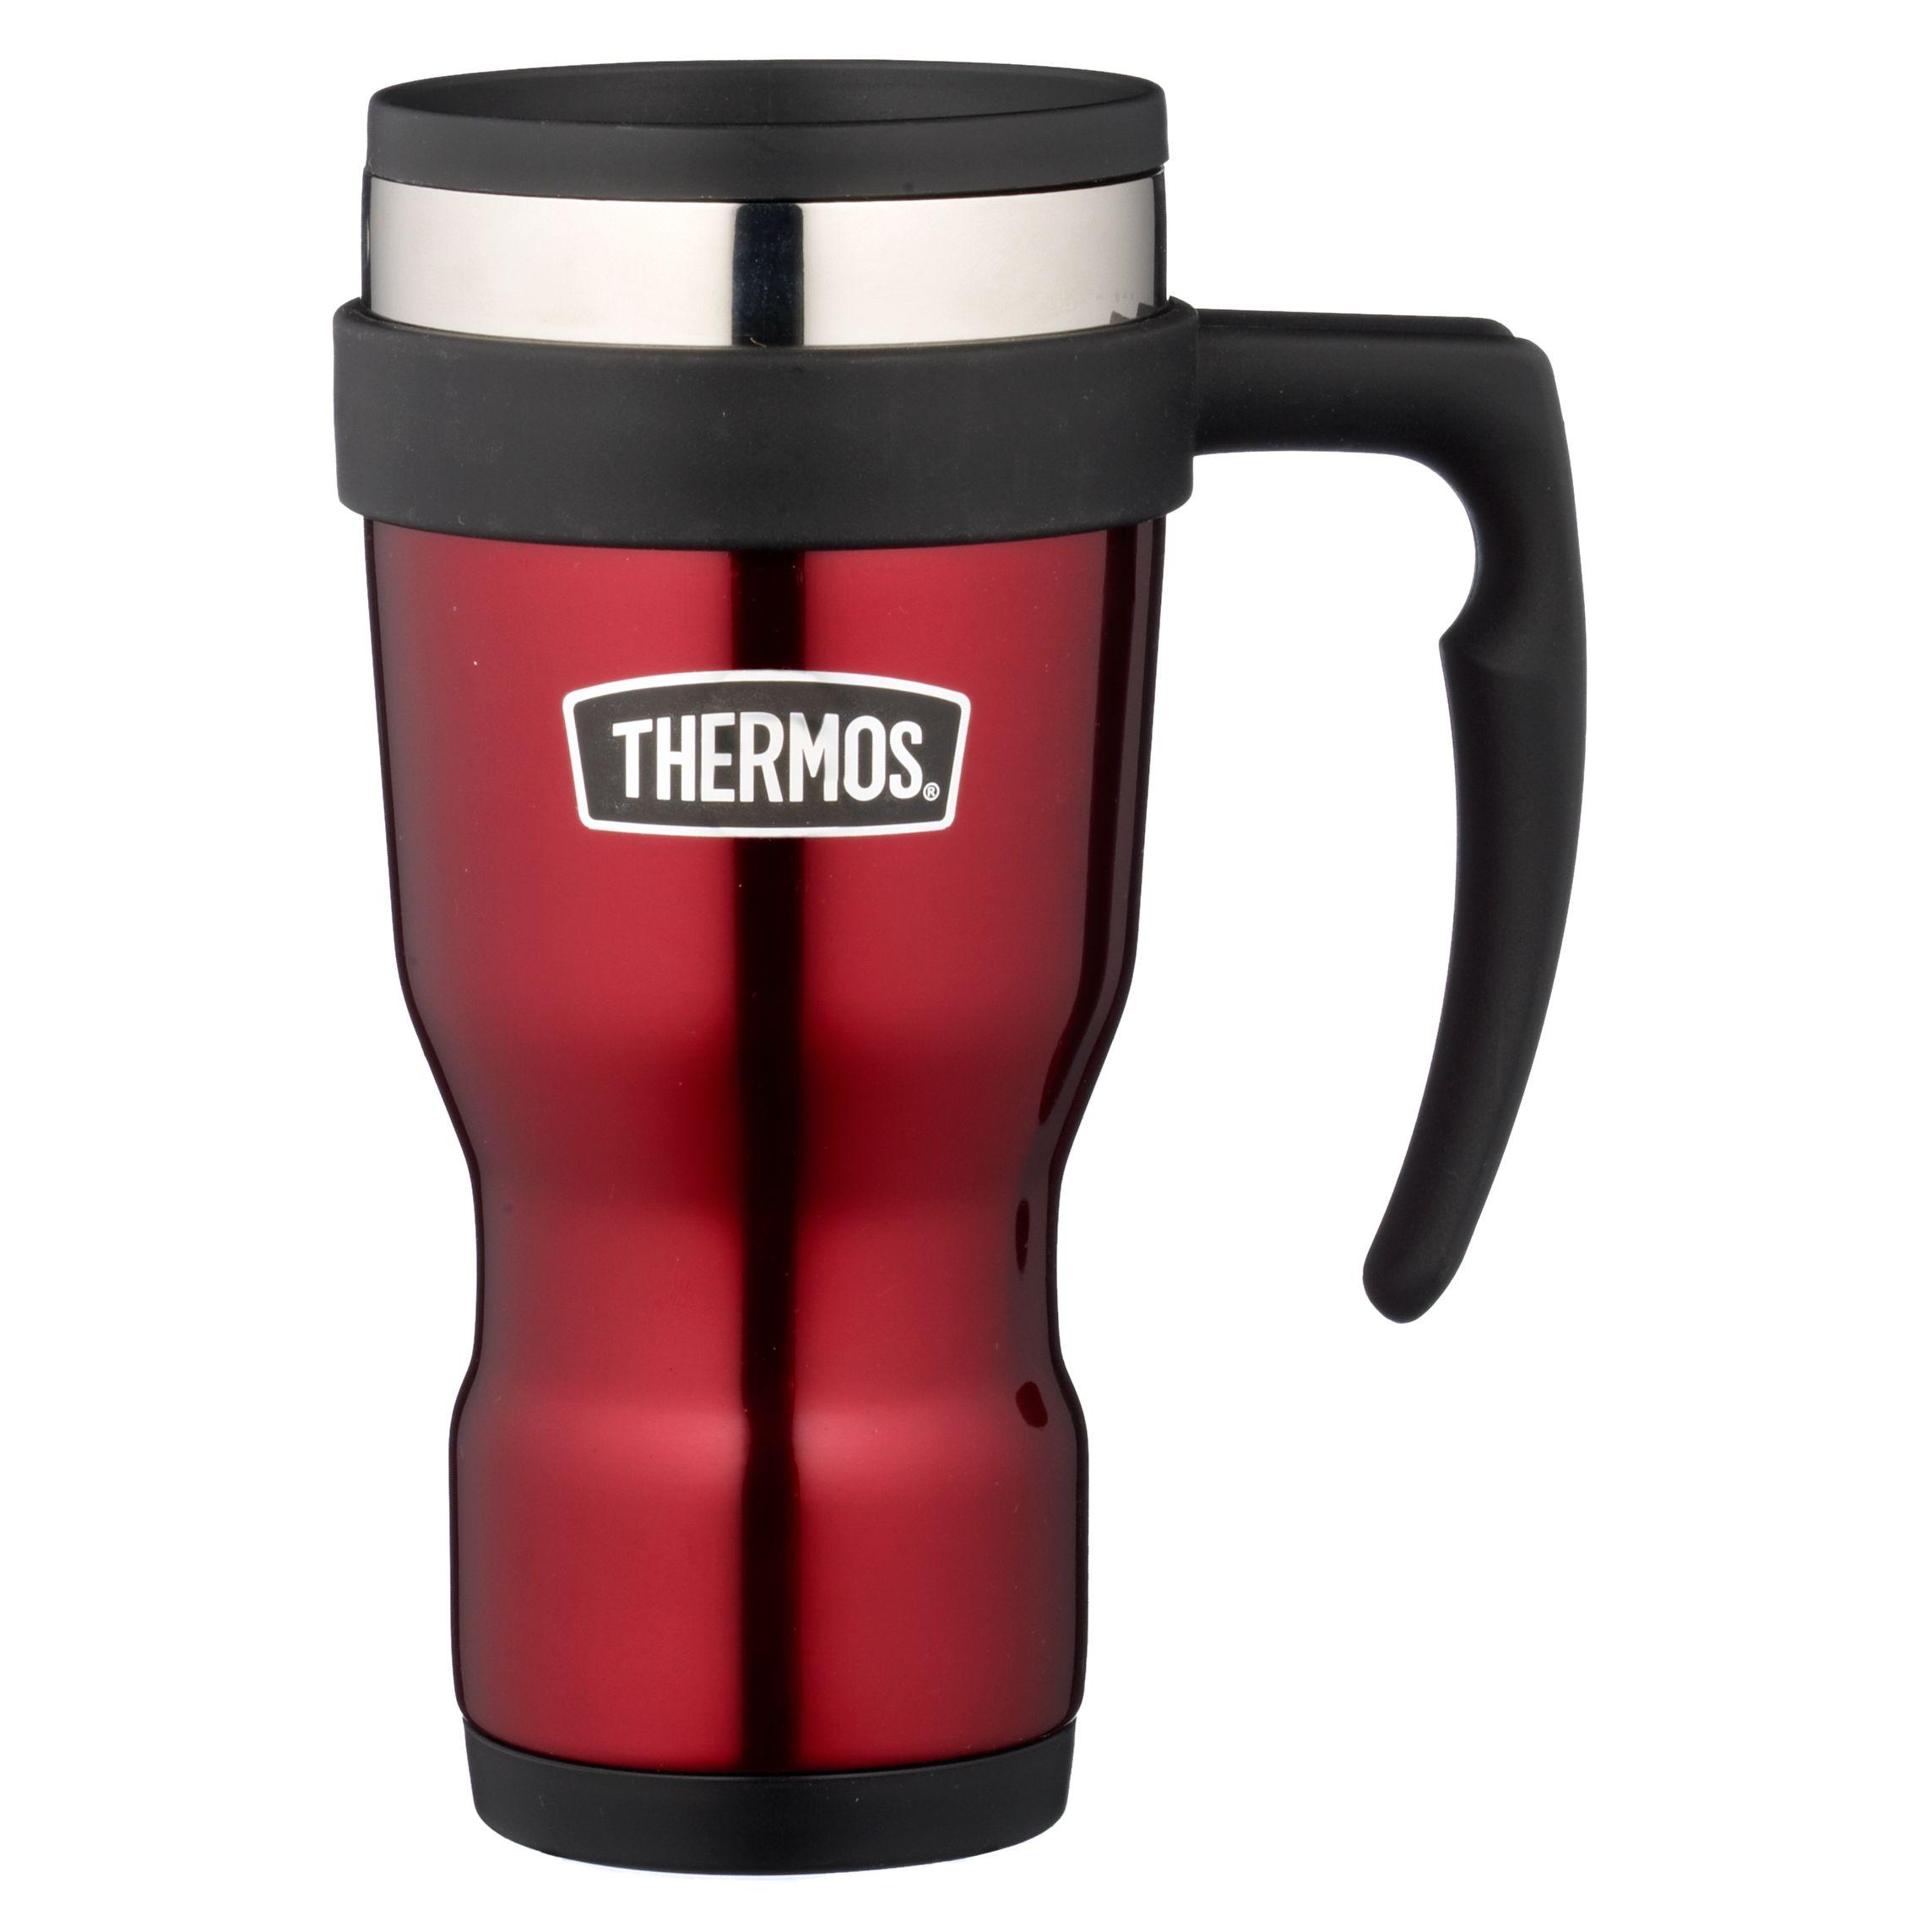 Thermos Vintage Travel Mug, Red